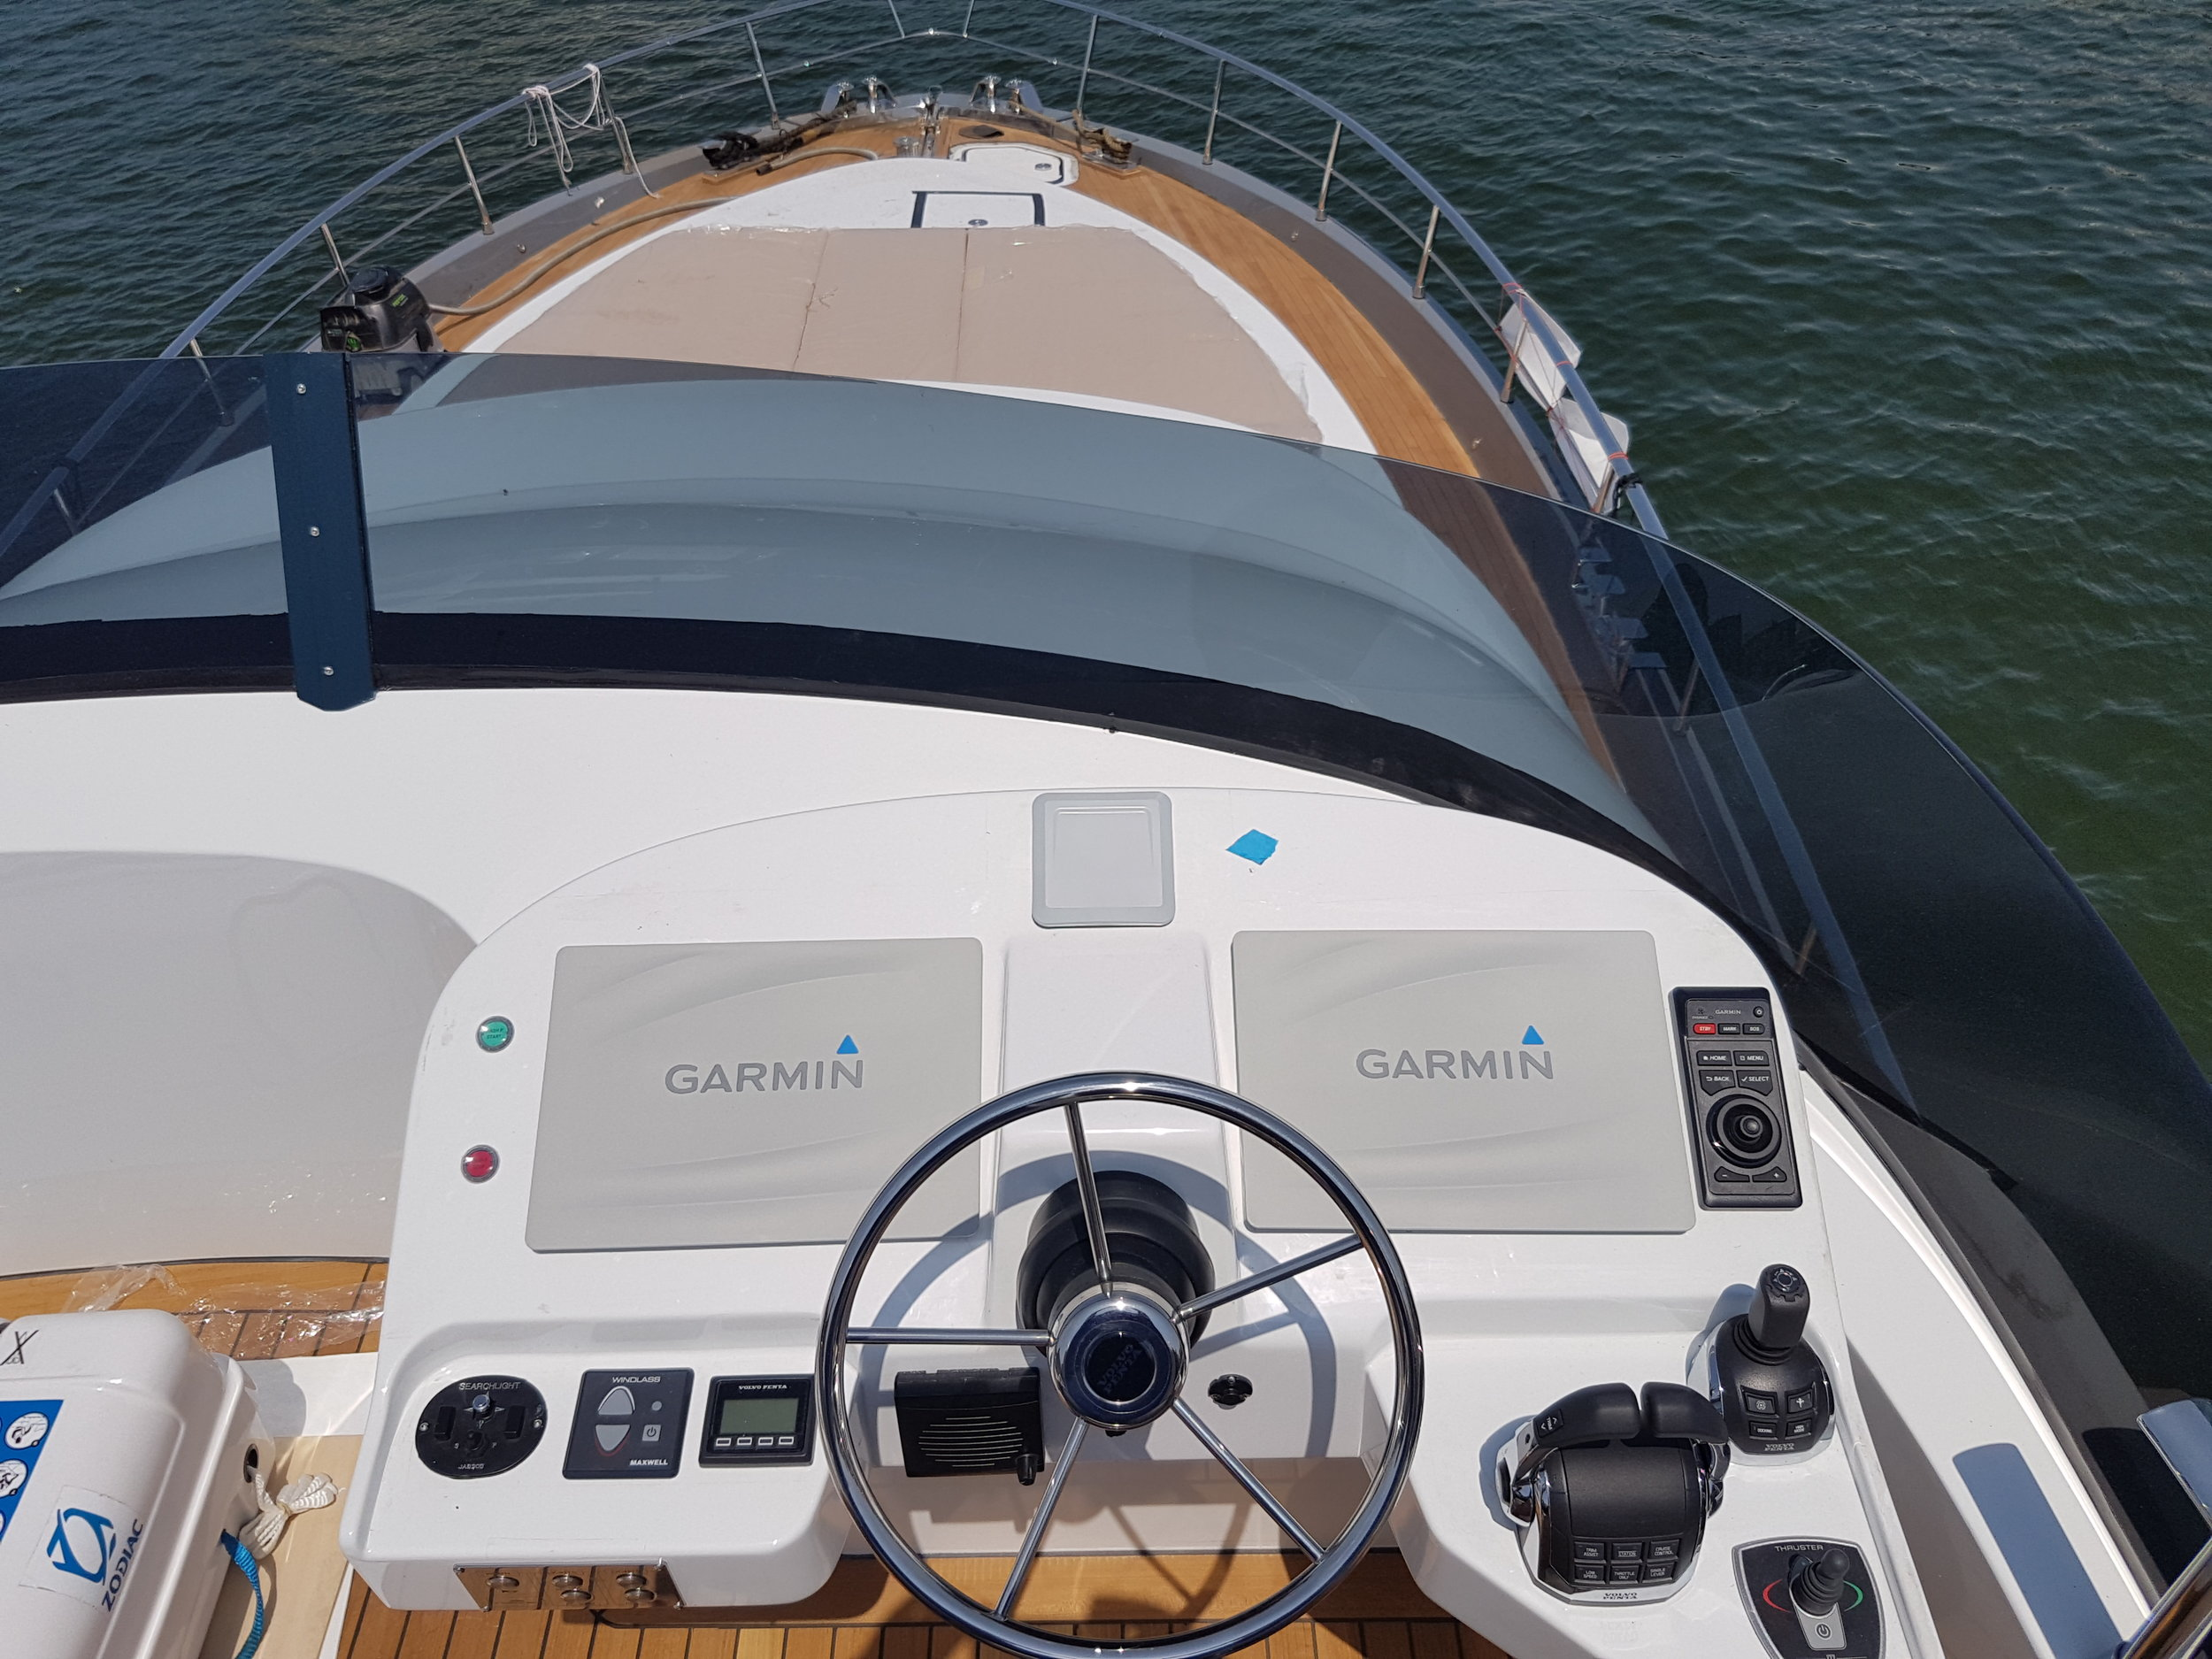 Foto Upper wheelhouse-pilot station-Istante-design- yacht-general arrangement-profile-sketch architect-carignani-design-concept-luxury-boat-motor.jpg